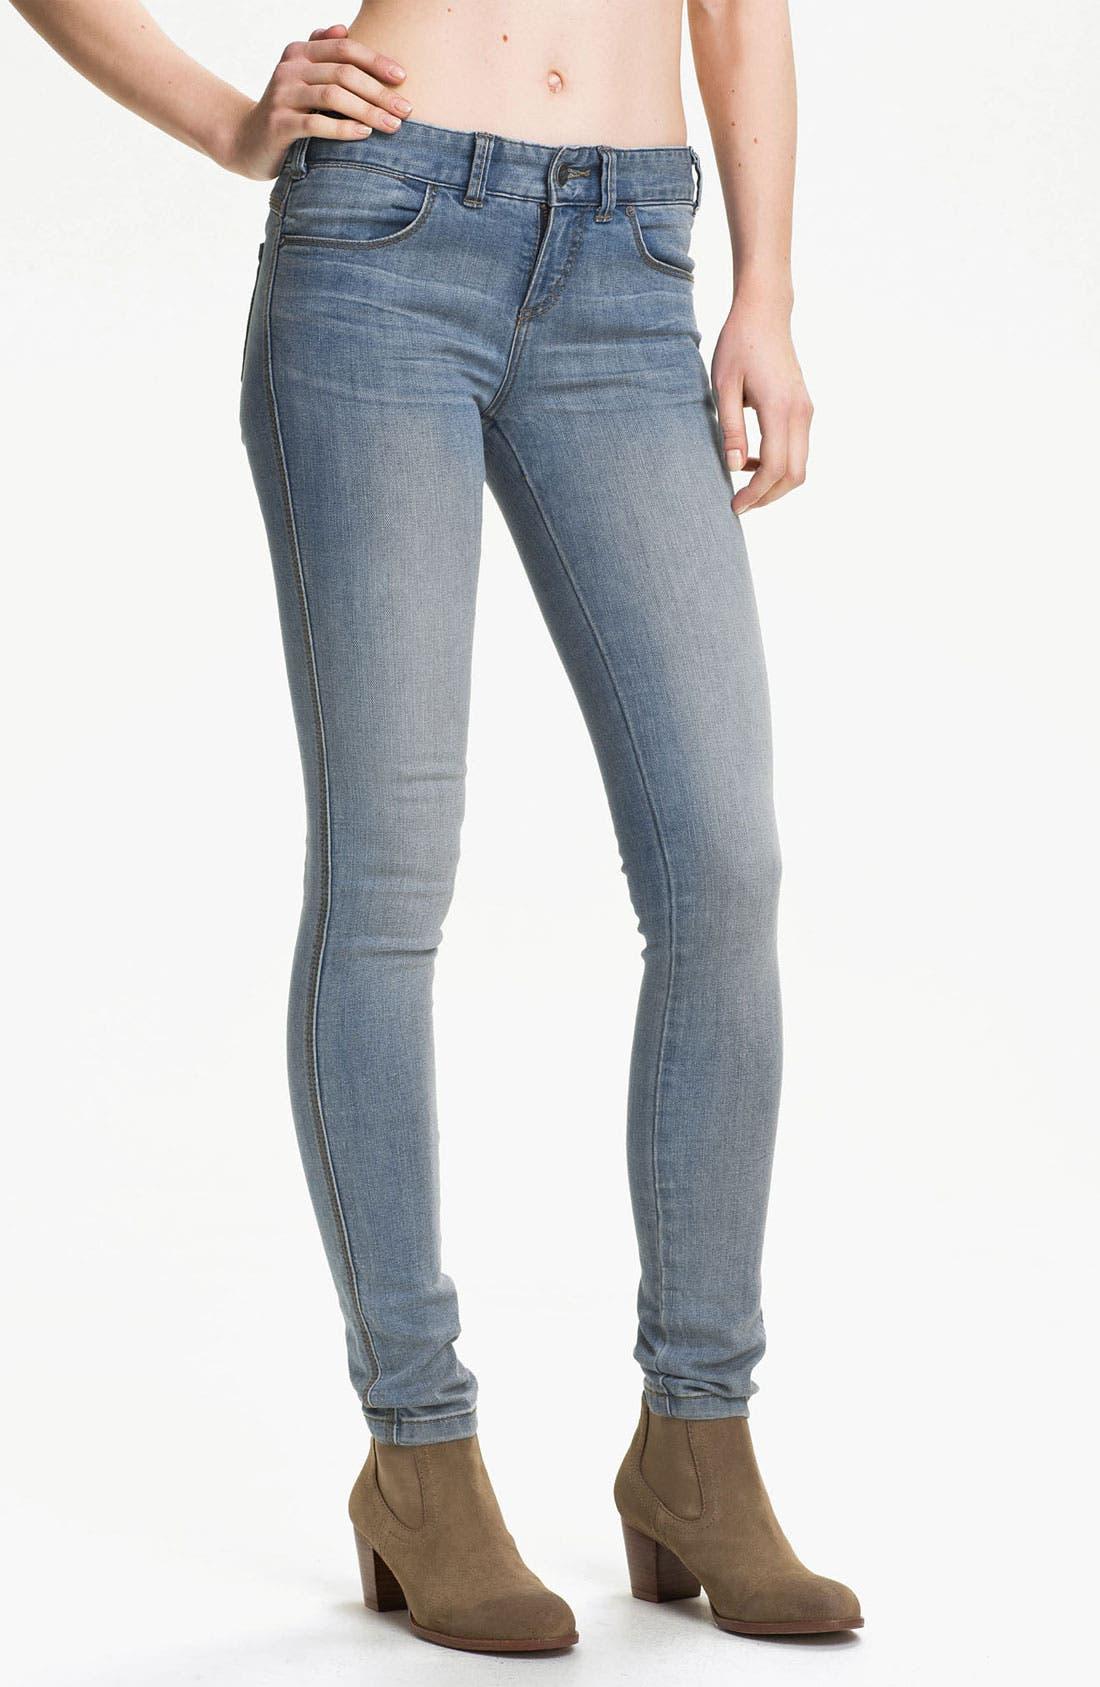 Alternate Image 1 Selected - Free People Stretch Denim Skinny Jeans (Sky Wash)